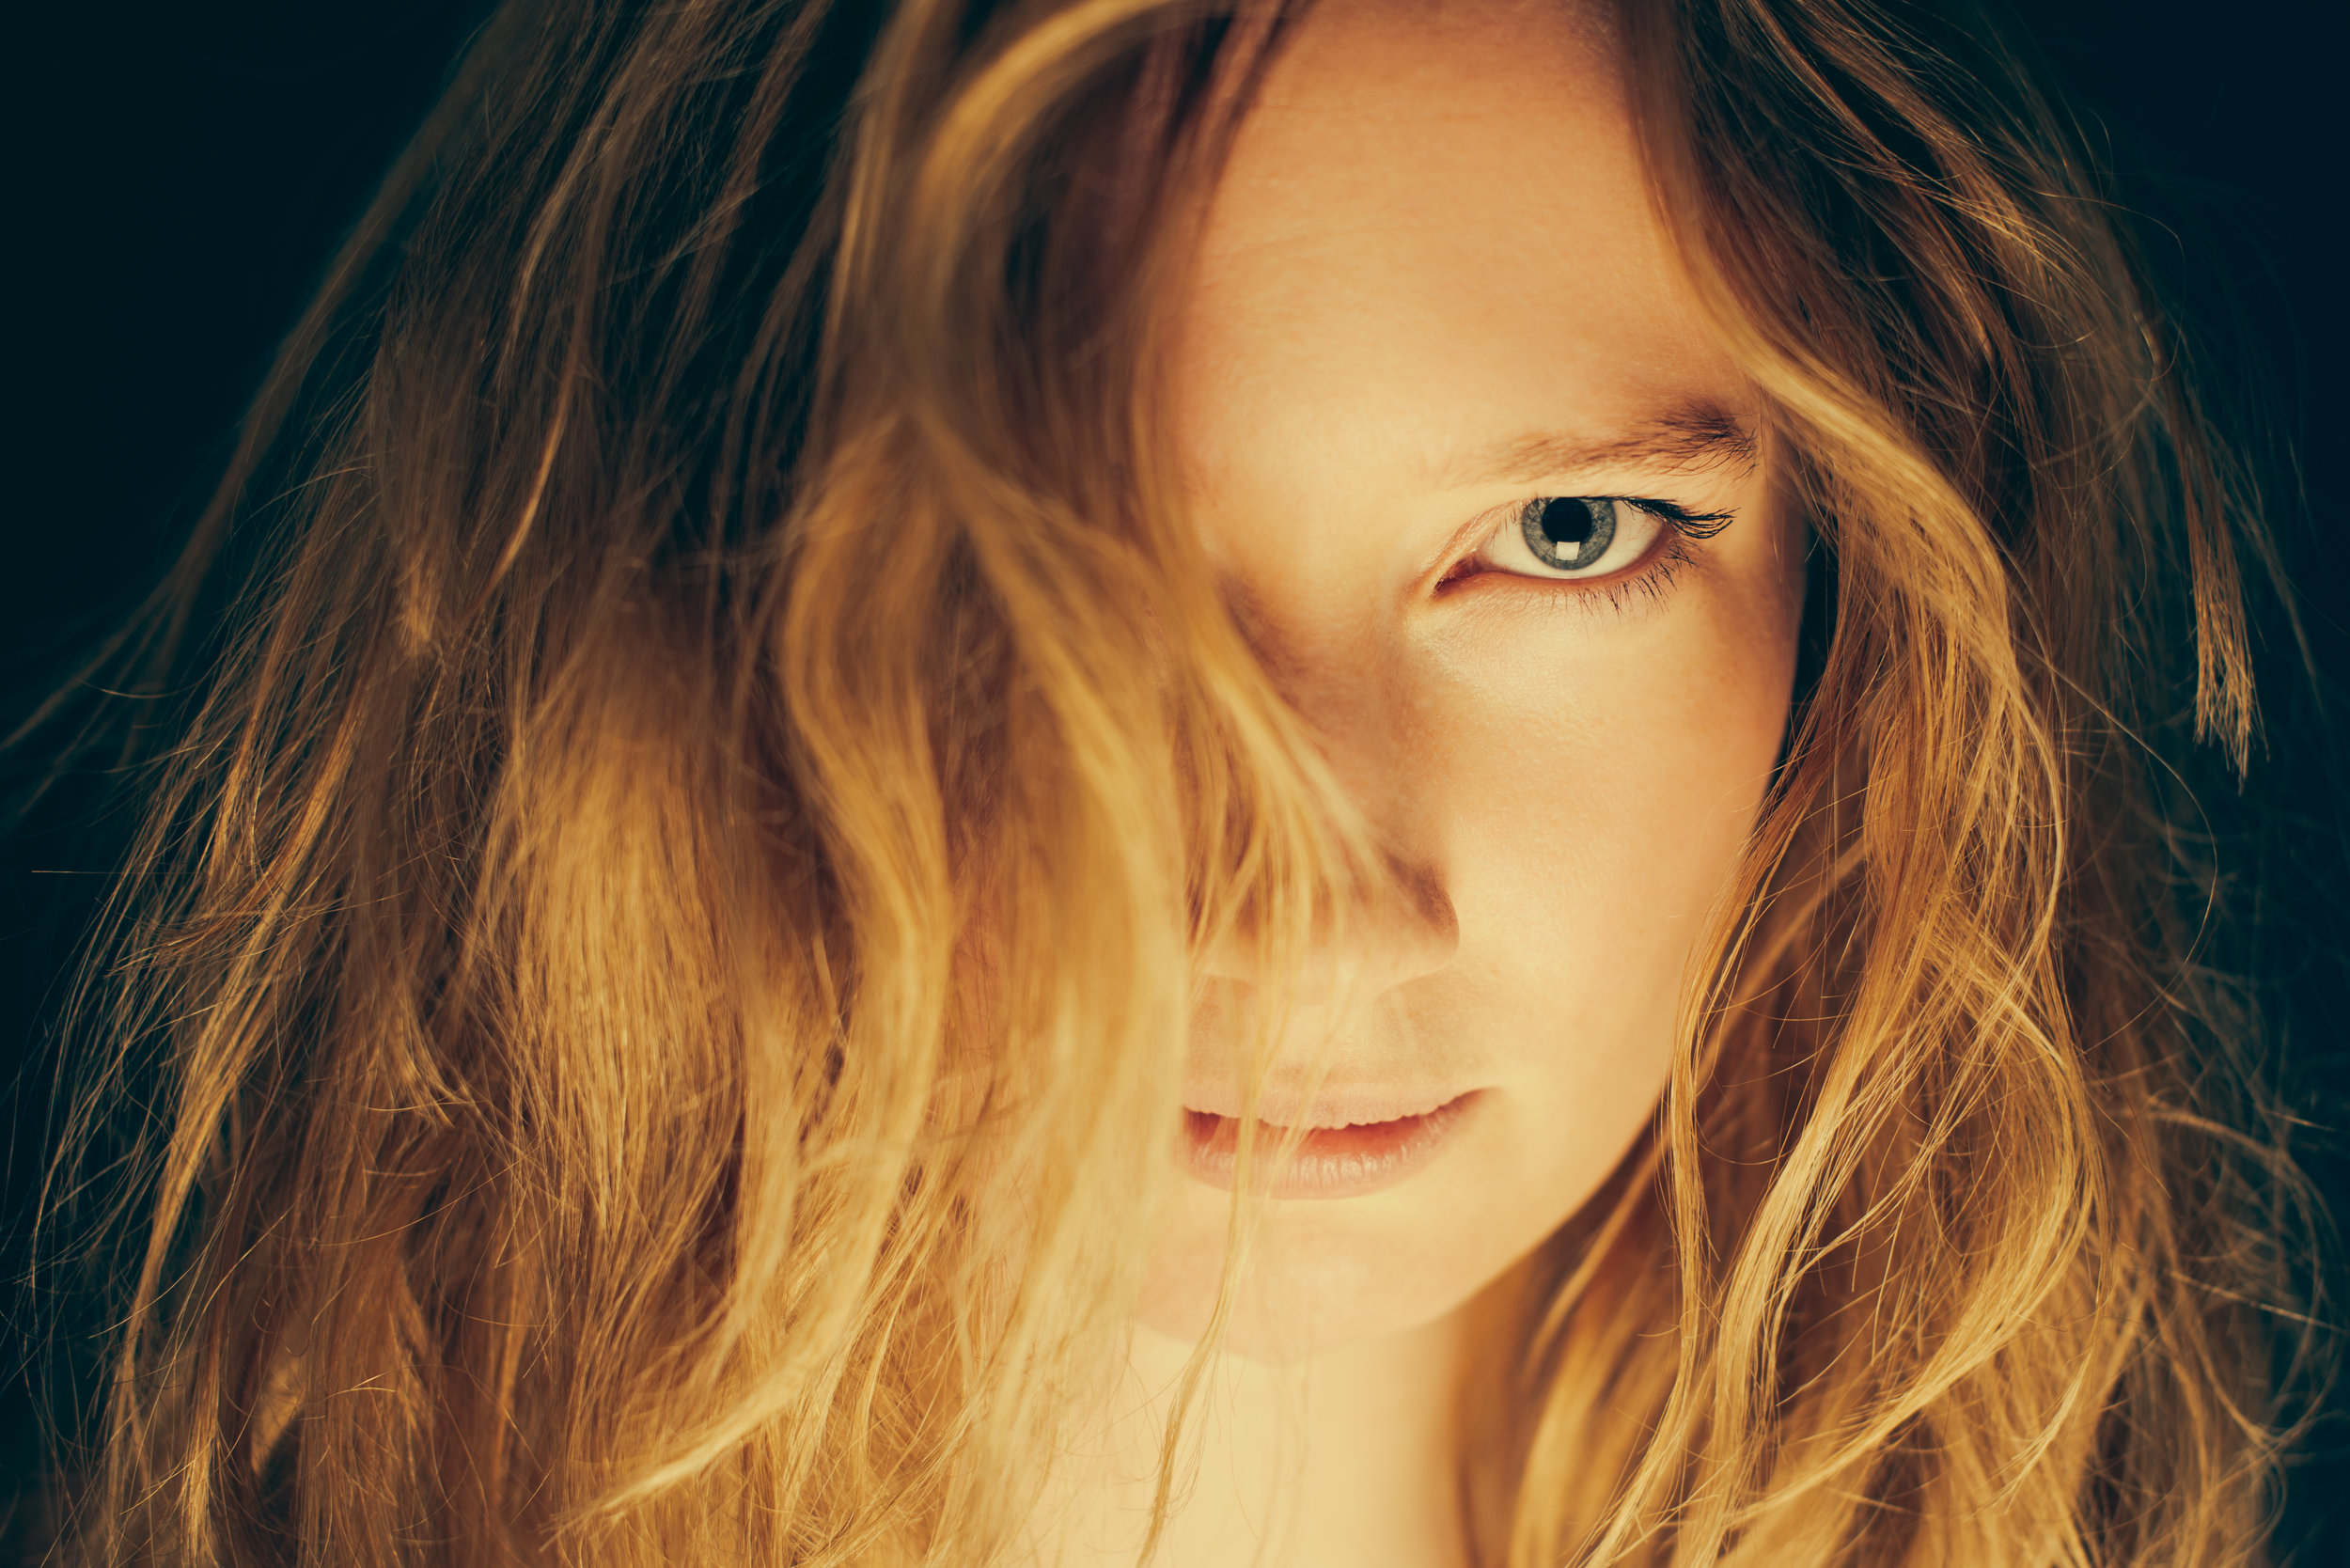 Louisa-9524.jpg